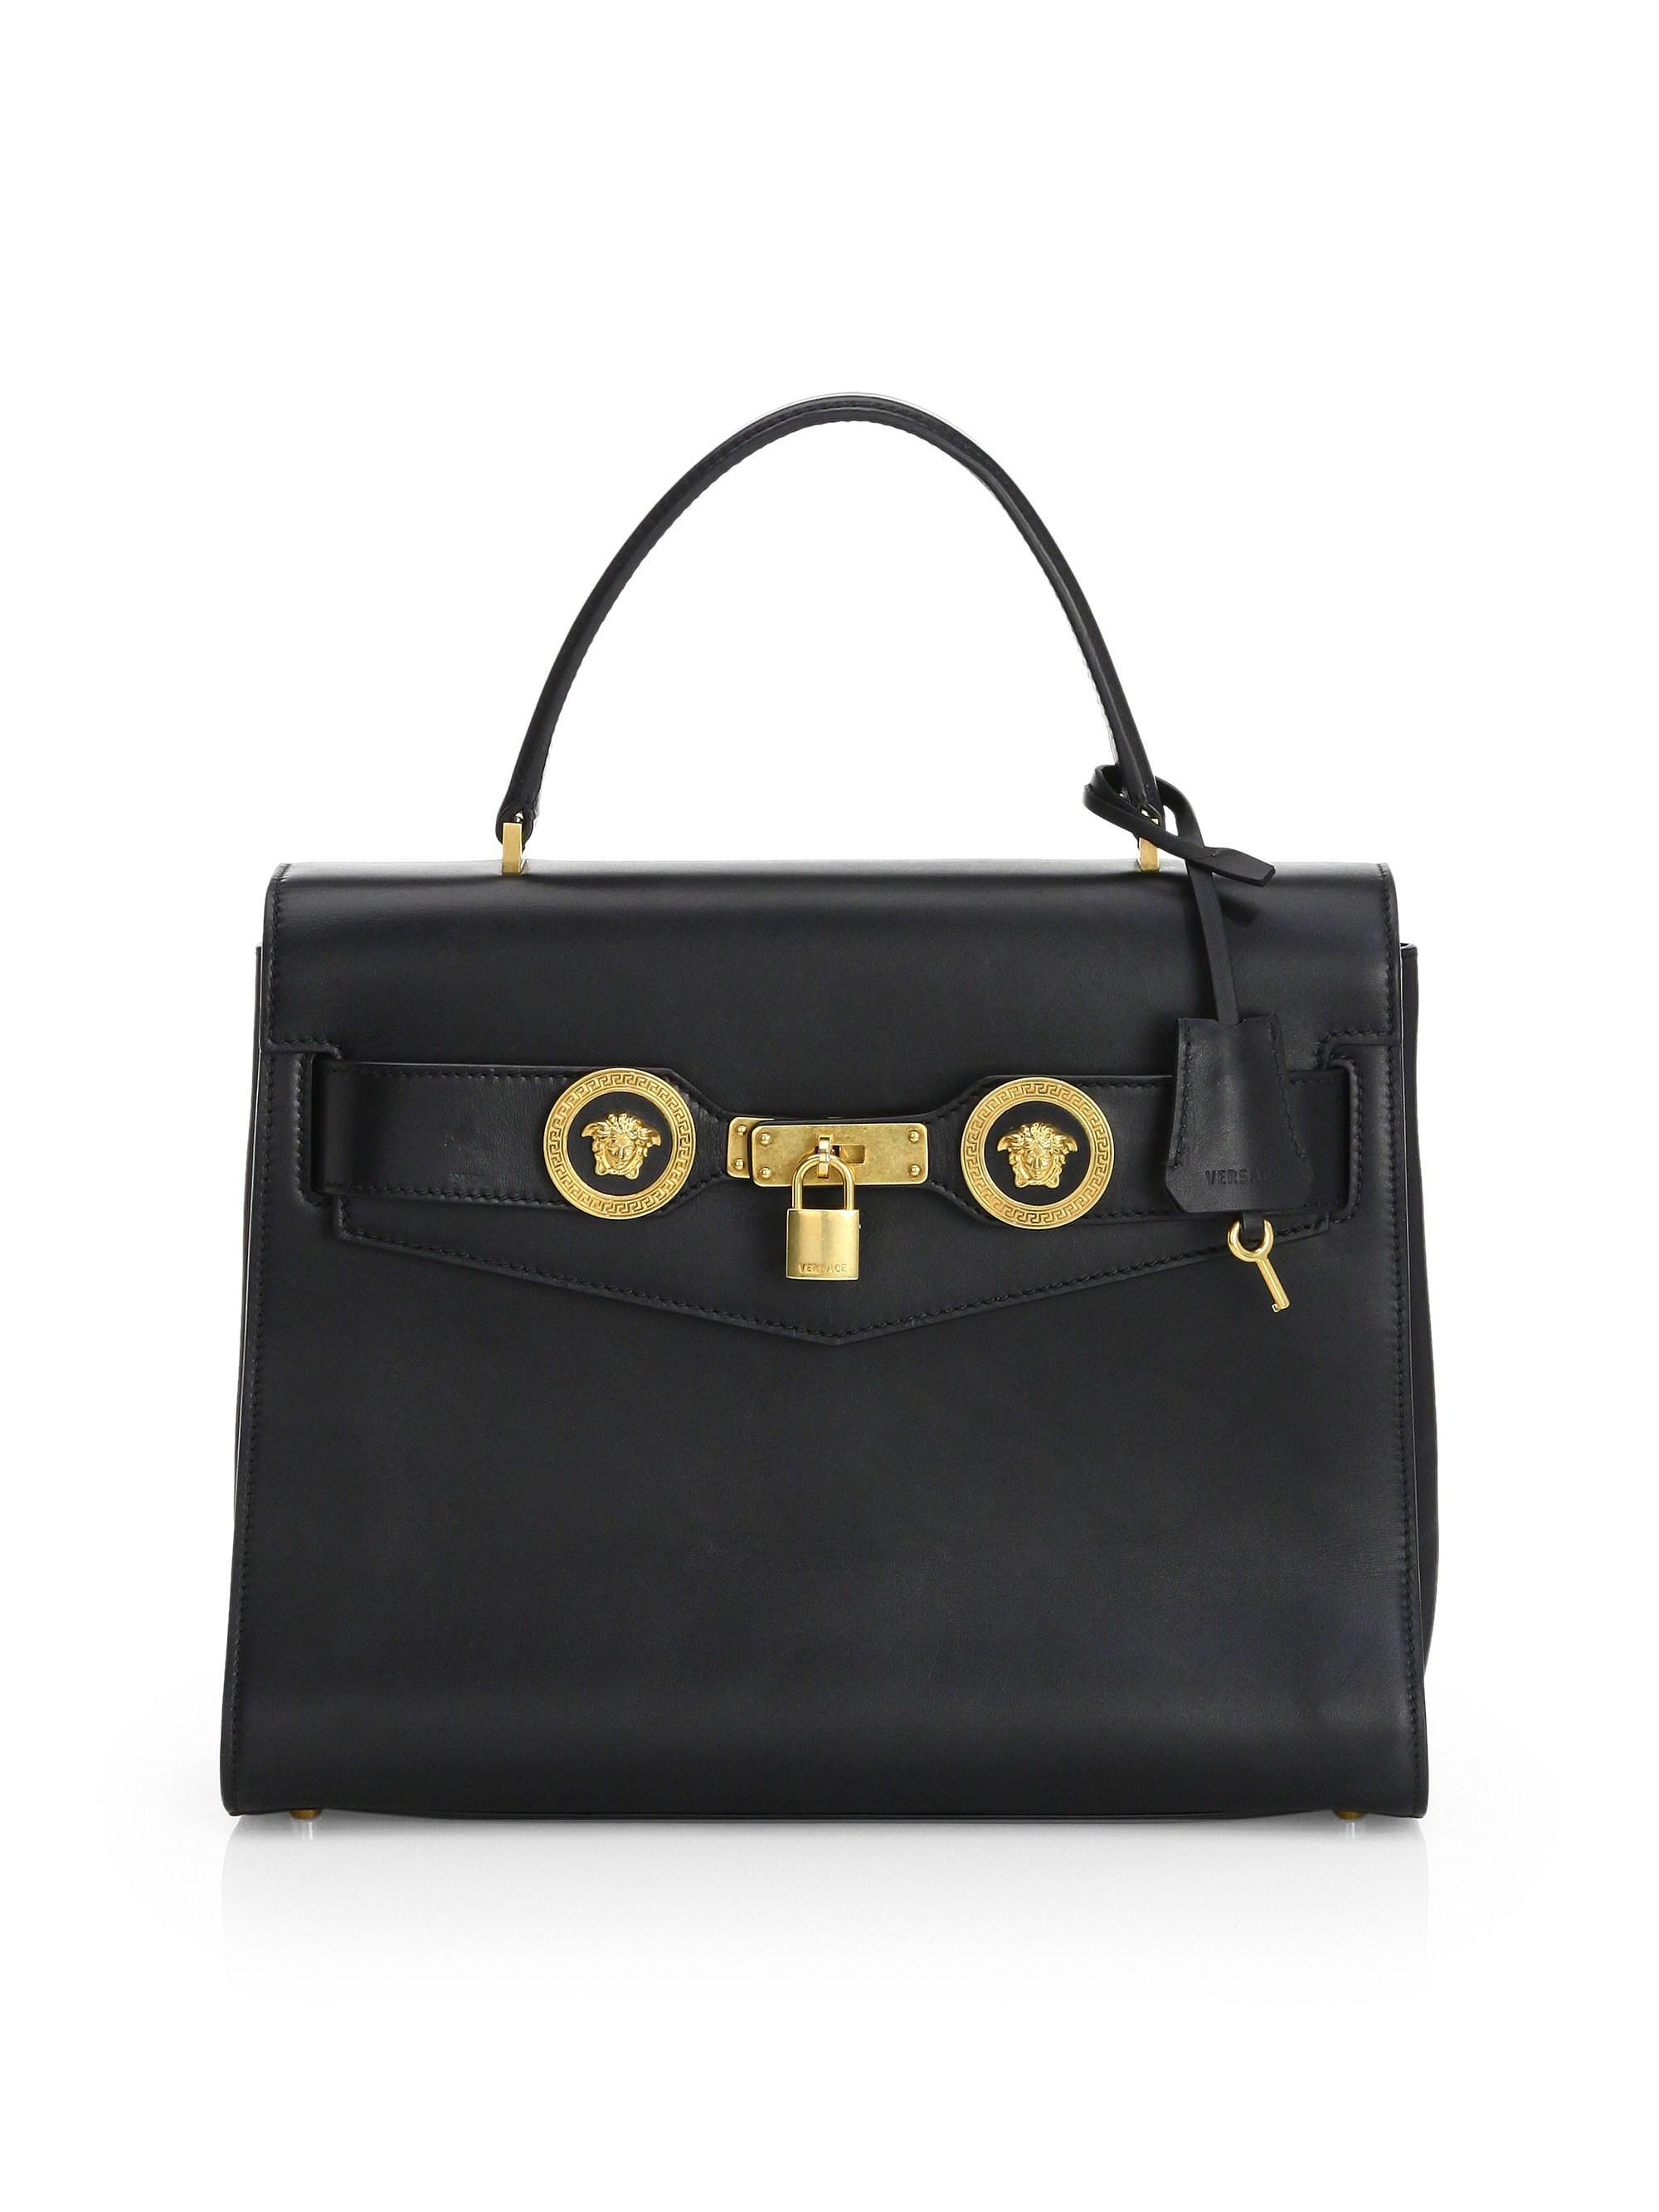 Versace - Women s Icon Leather Satchel Bag - Black Gold - Lyst. View  fullscreen 797dd1b5e51d1